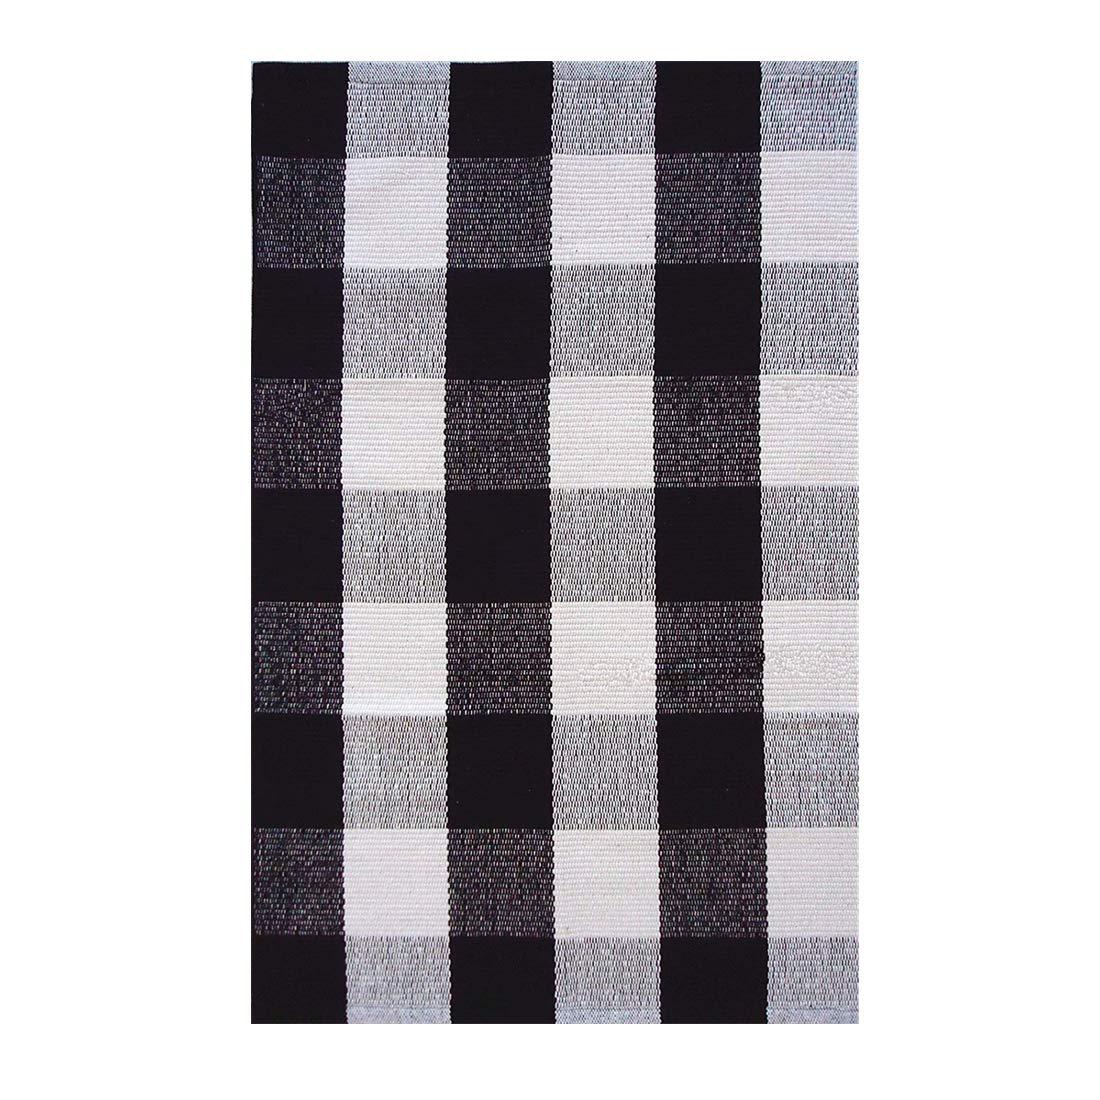 Ukeler Retro Farmhouse Tartan Checkered Plaid Rugs Door Mat - 100% Cotton - Black/White Hand-Woven Floor Rugs Washable Rag Throw Rugs for Kitchen/Bathroom/Entry Way/Laundry Room, 23.6''x35.4''